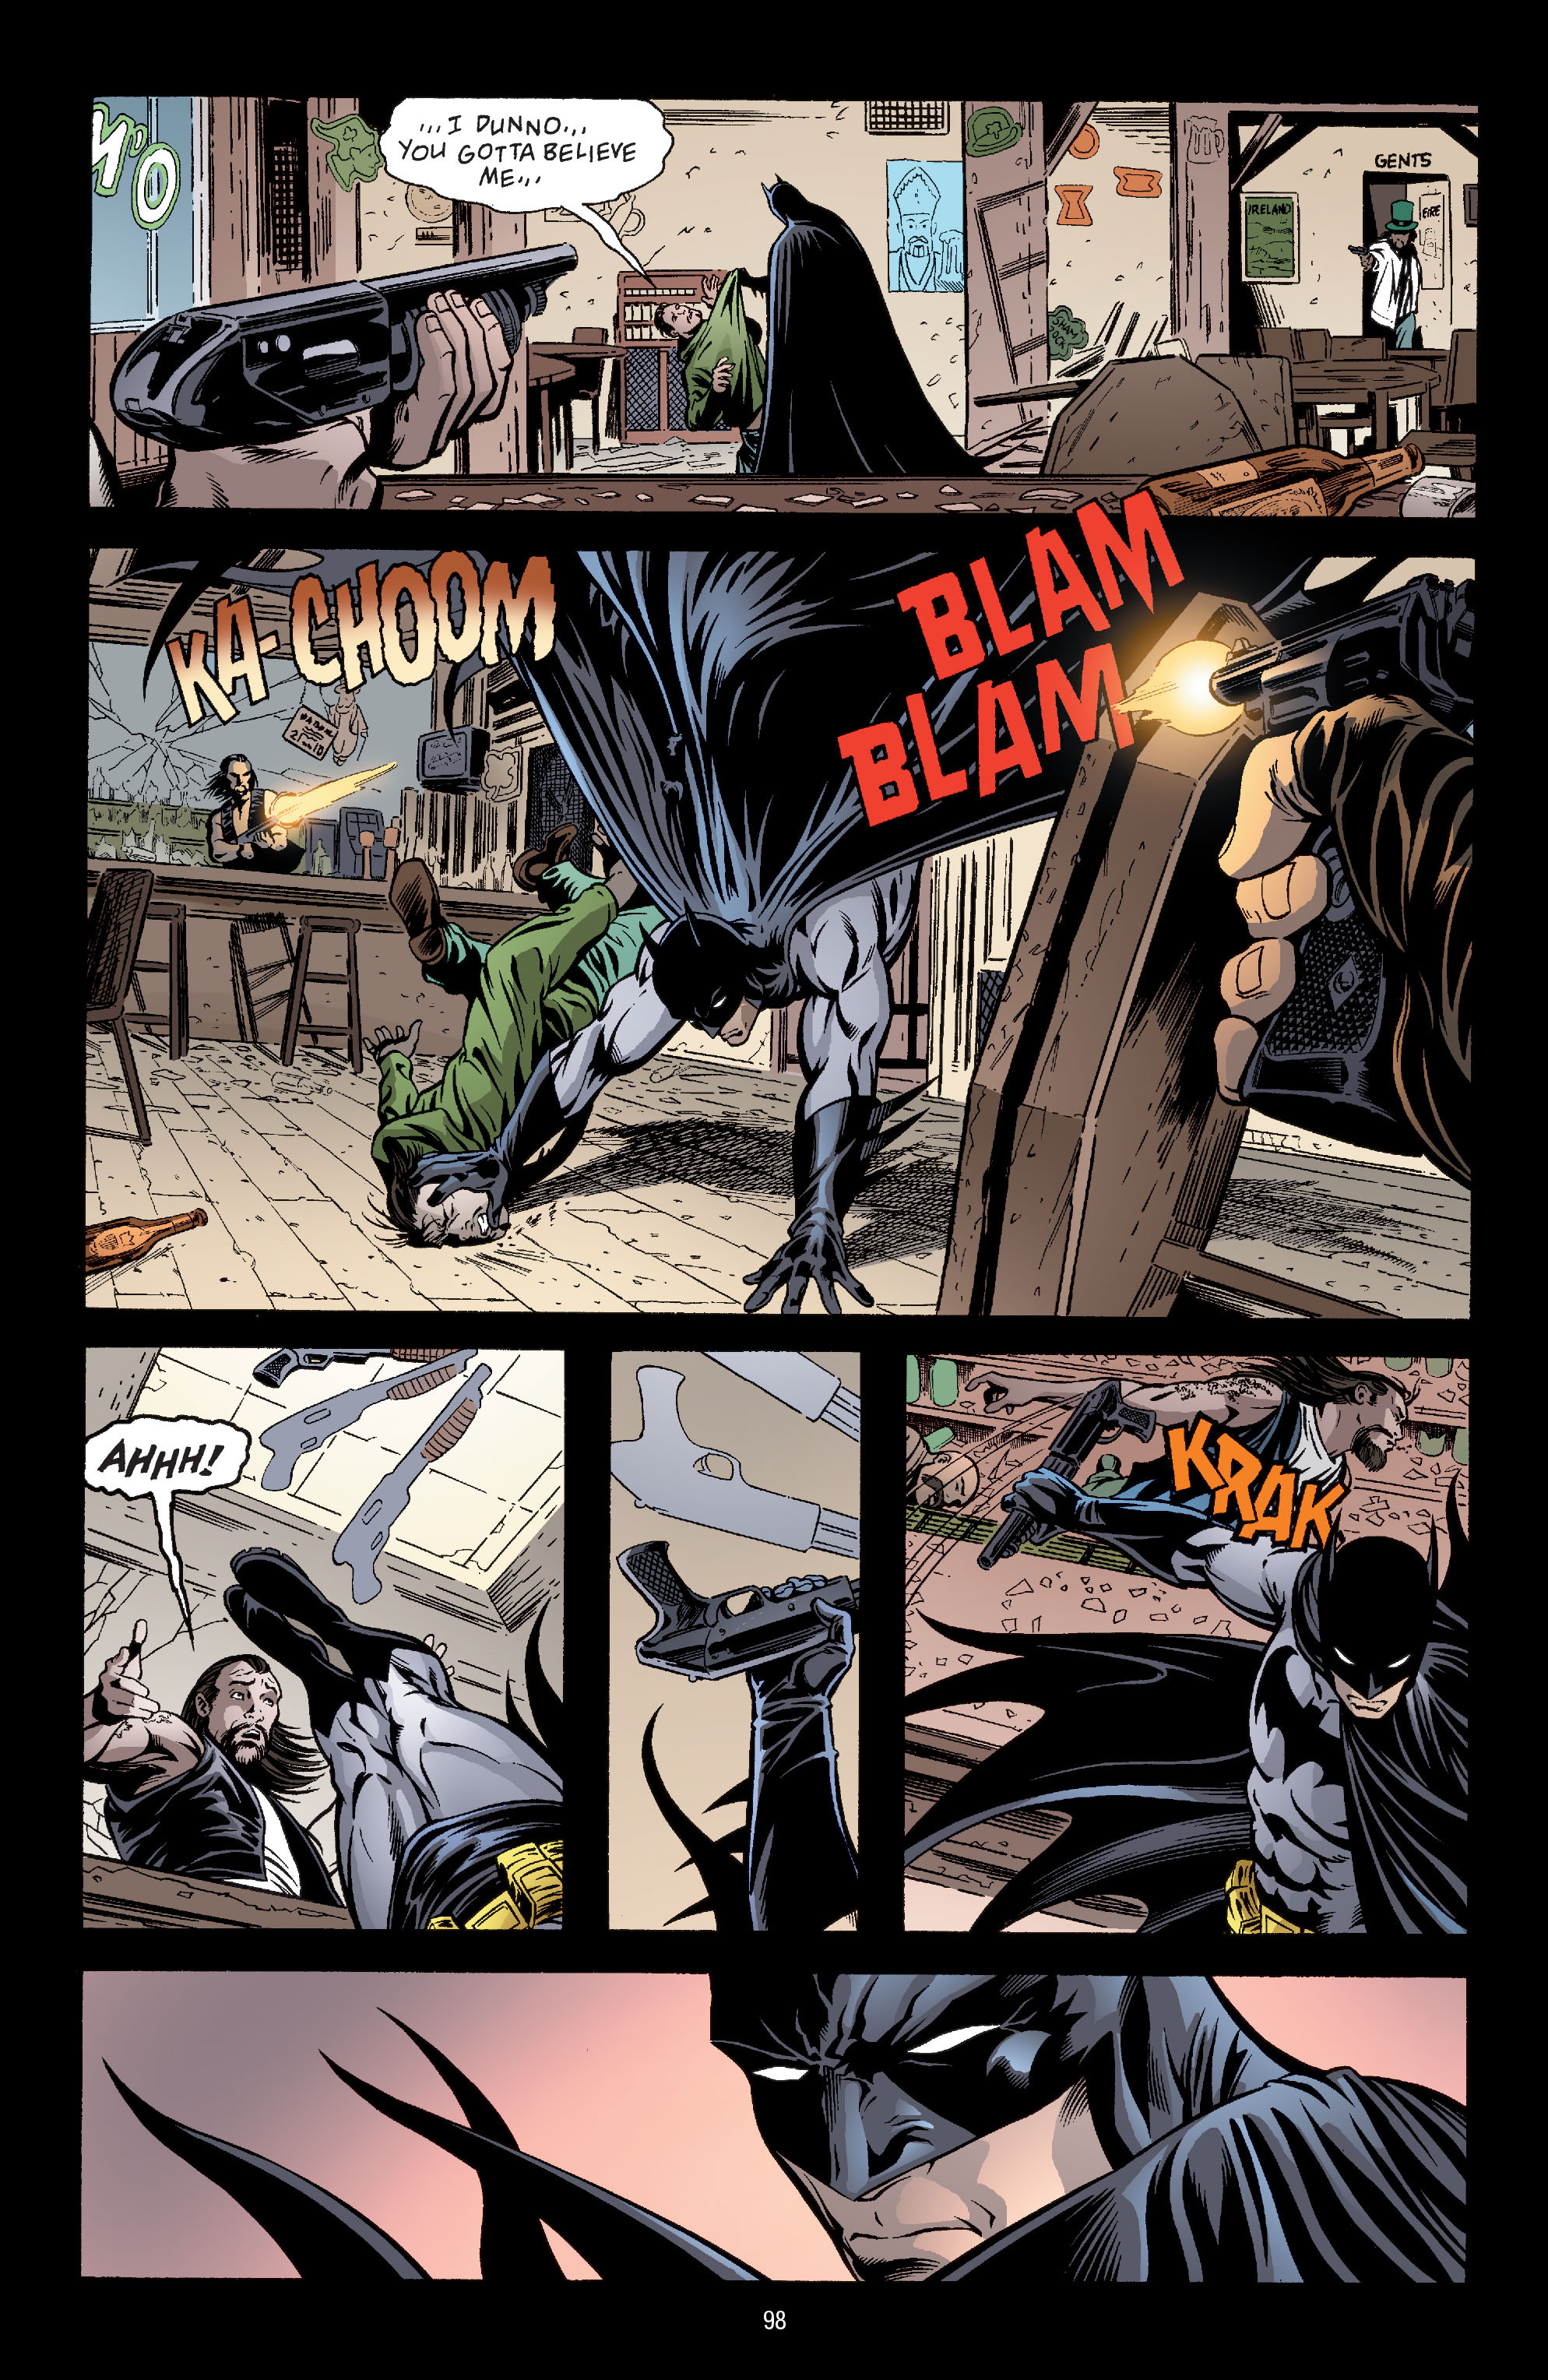 Batman: The Man Who Laughs chap 1 pic 99